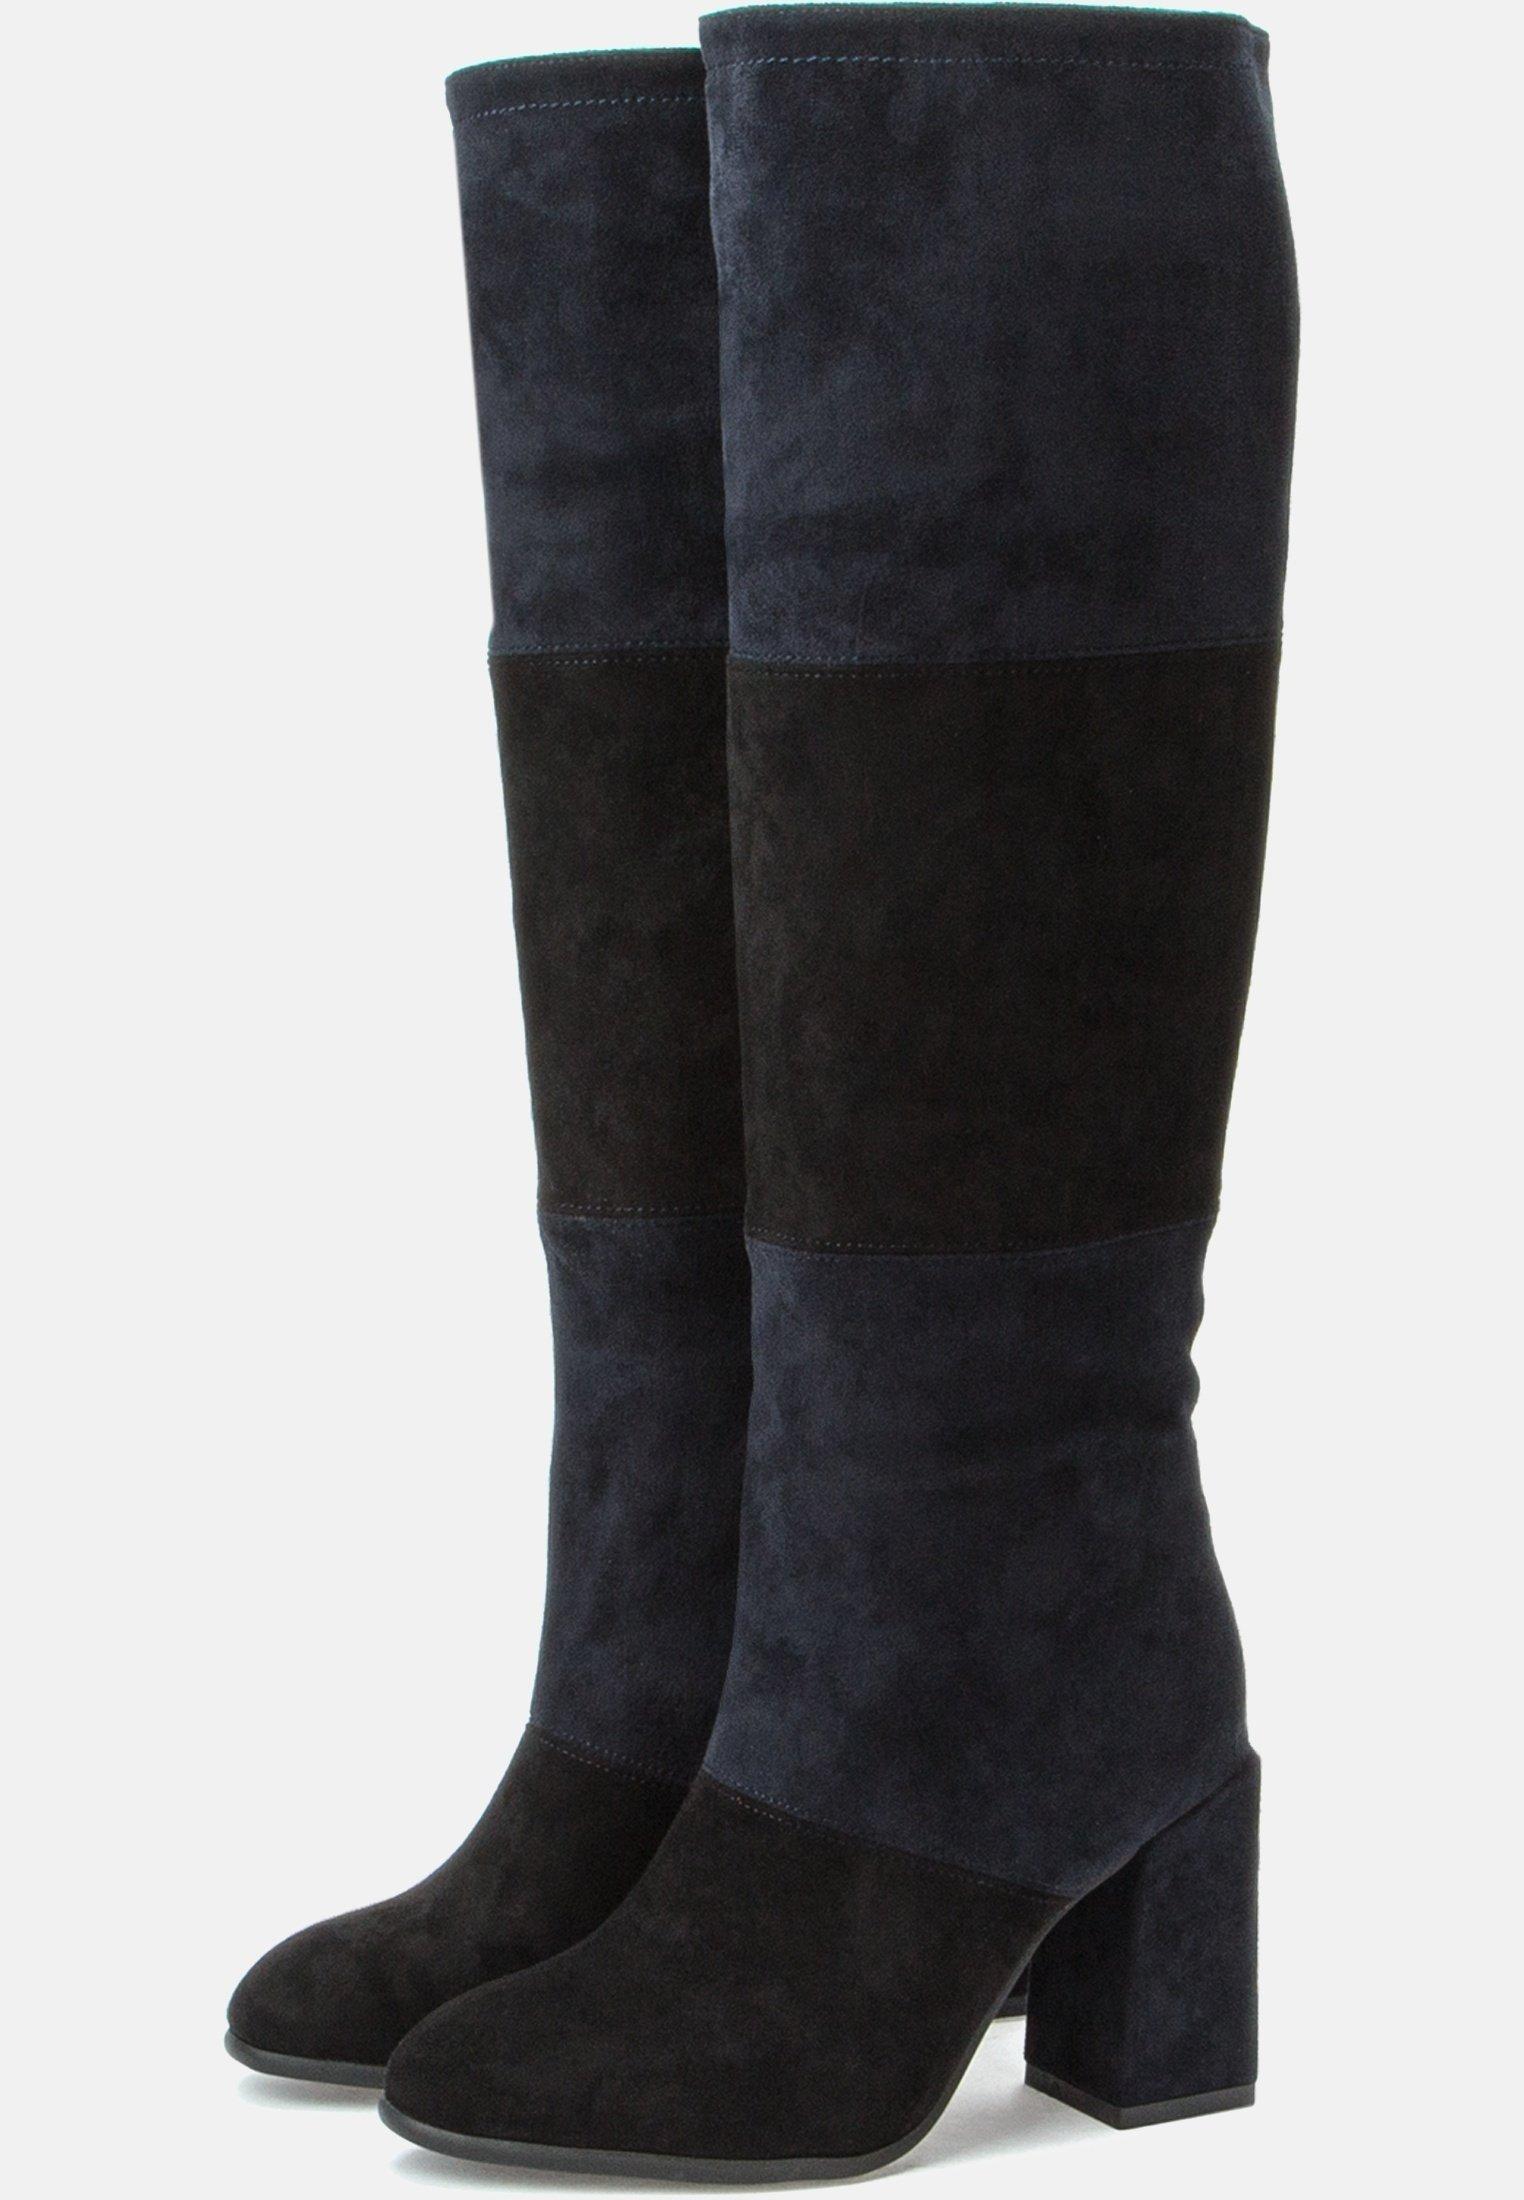 Betsy Bottes à talons hauts - black dark blue - Bottes femme Designer